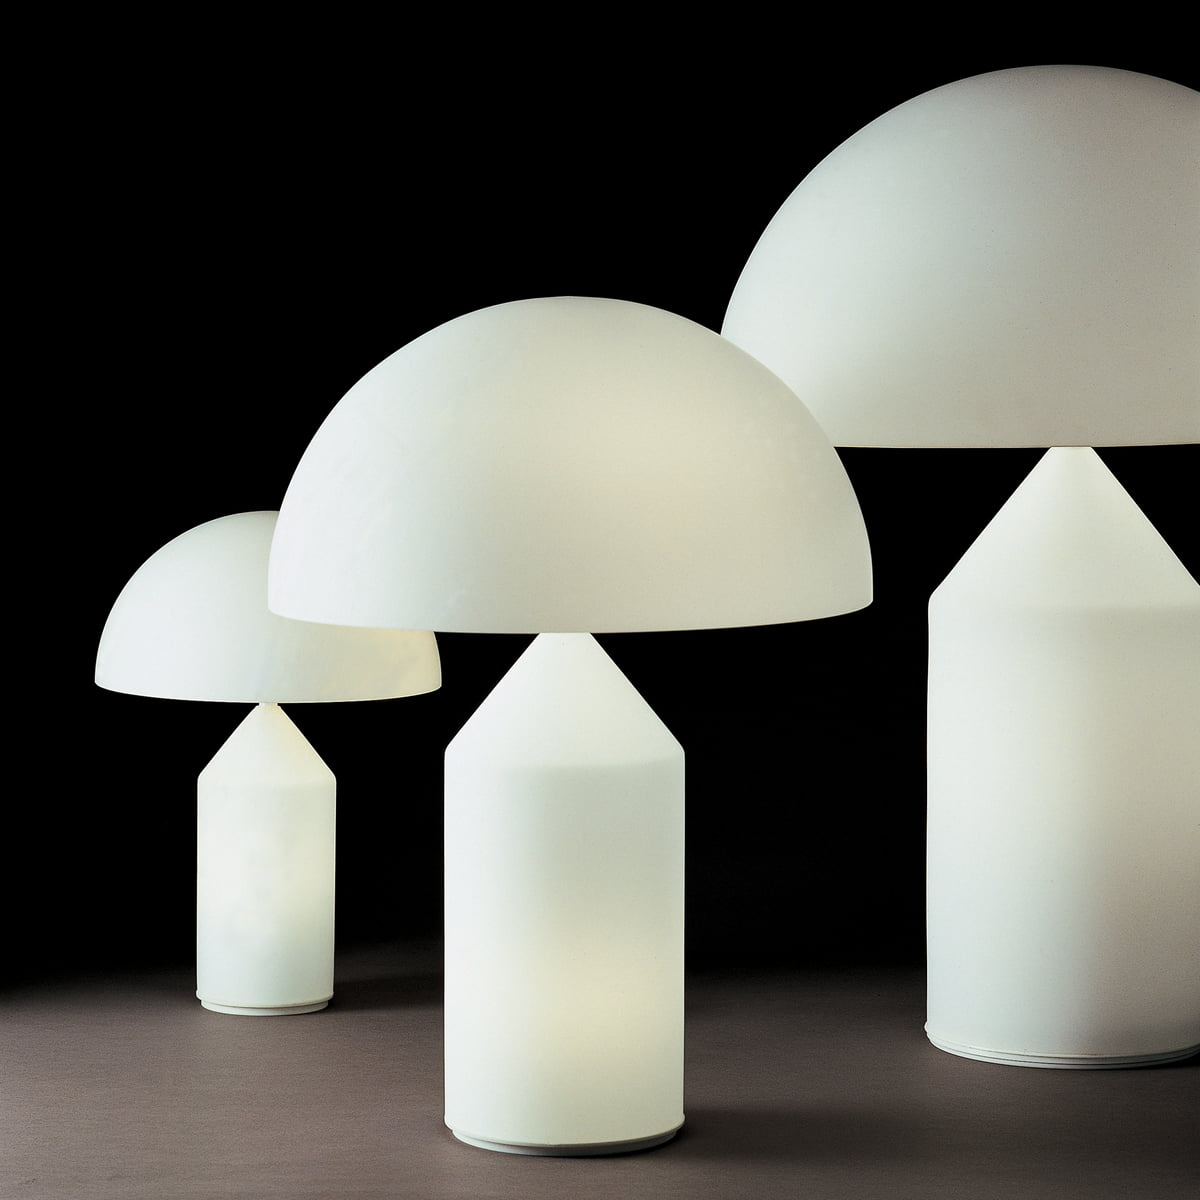 atollo table lamp oluce shop. Black Bedroom Furniture Sets. Home Design Ideas